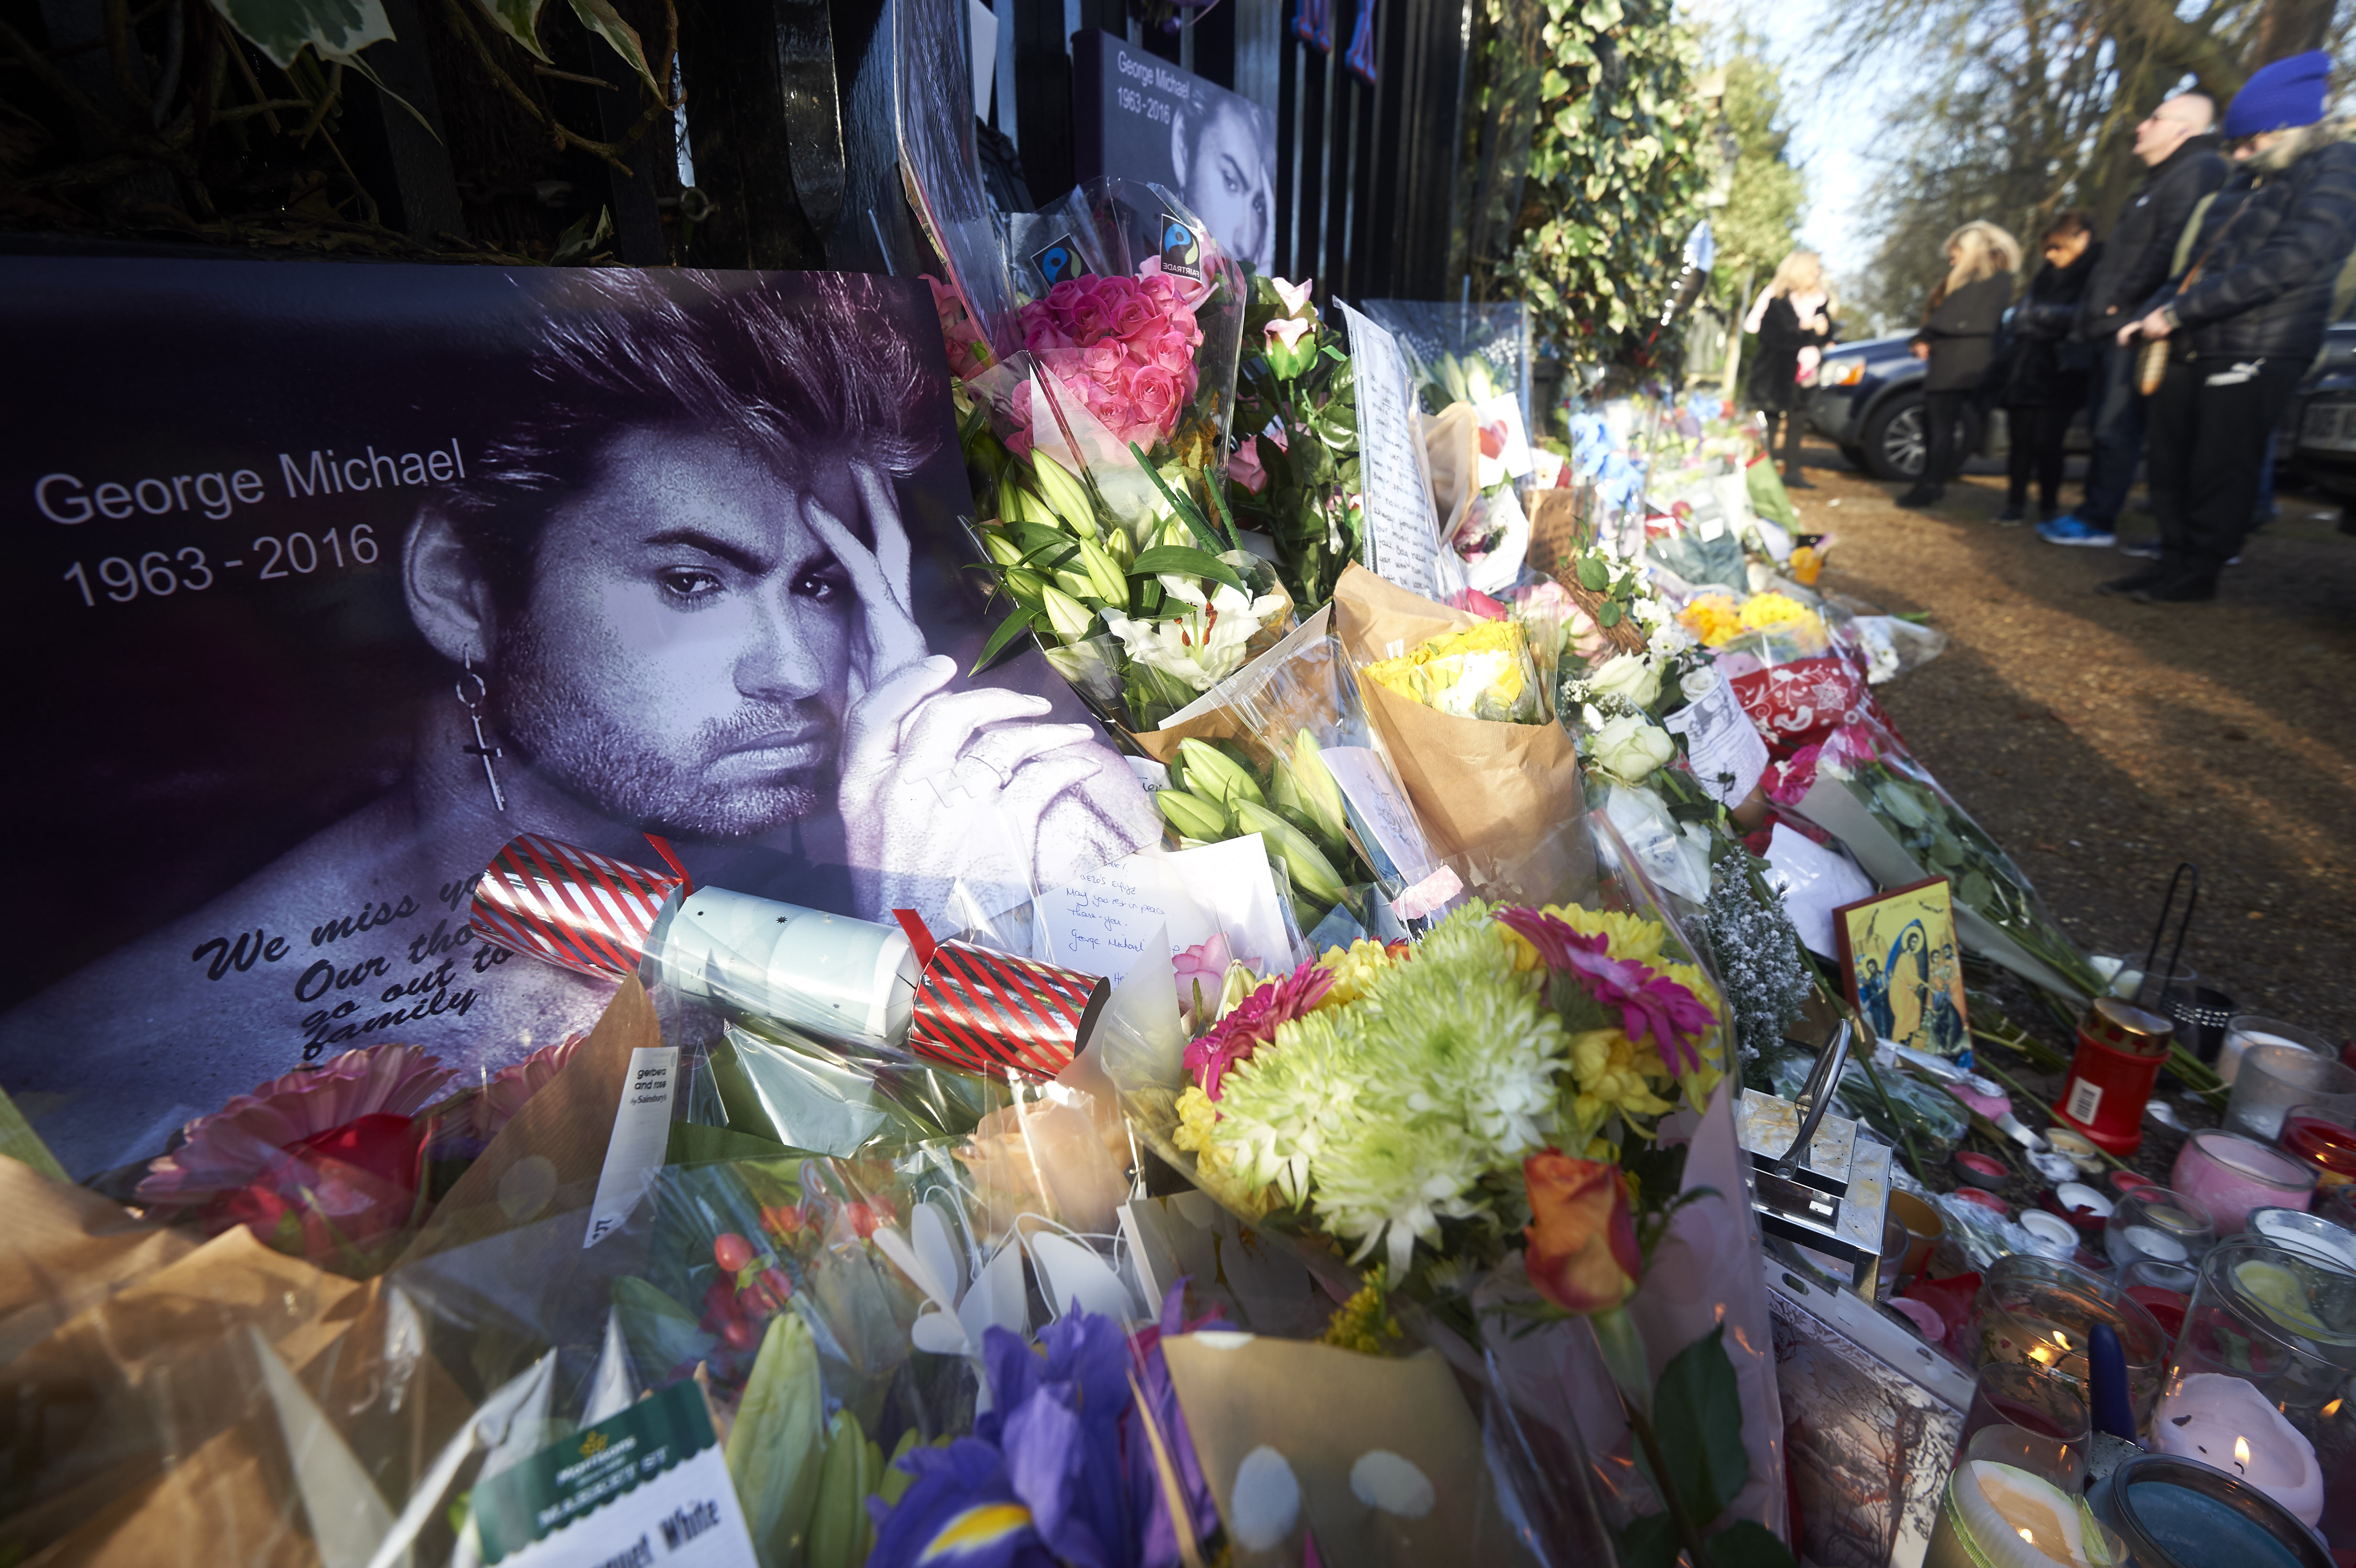 Forense confirma que cantante murió por causas naturales — George Michael